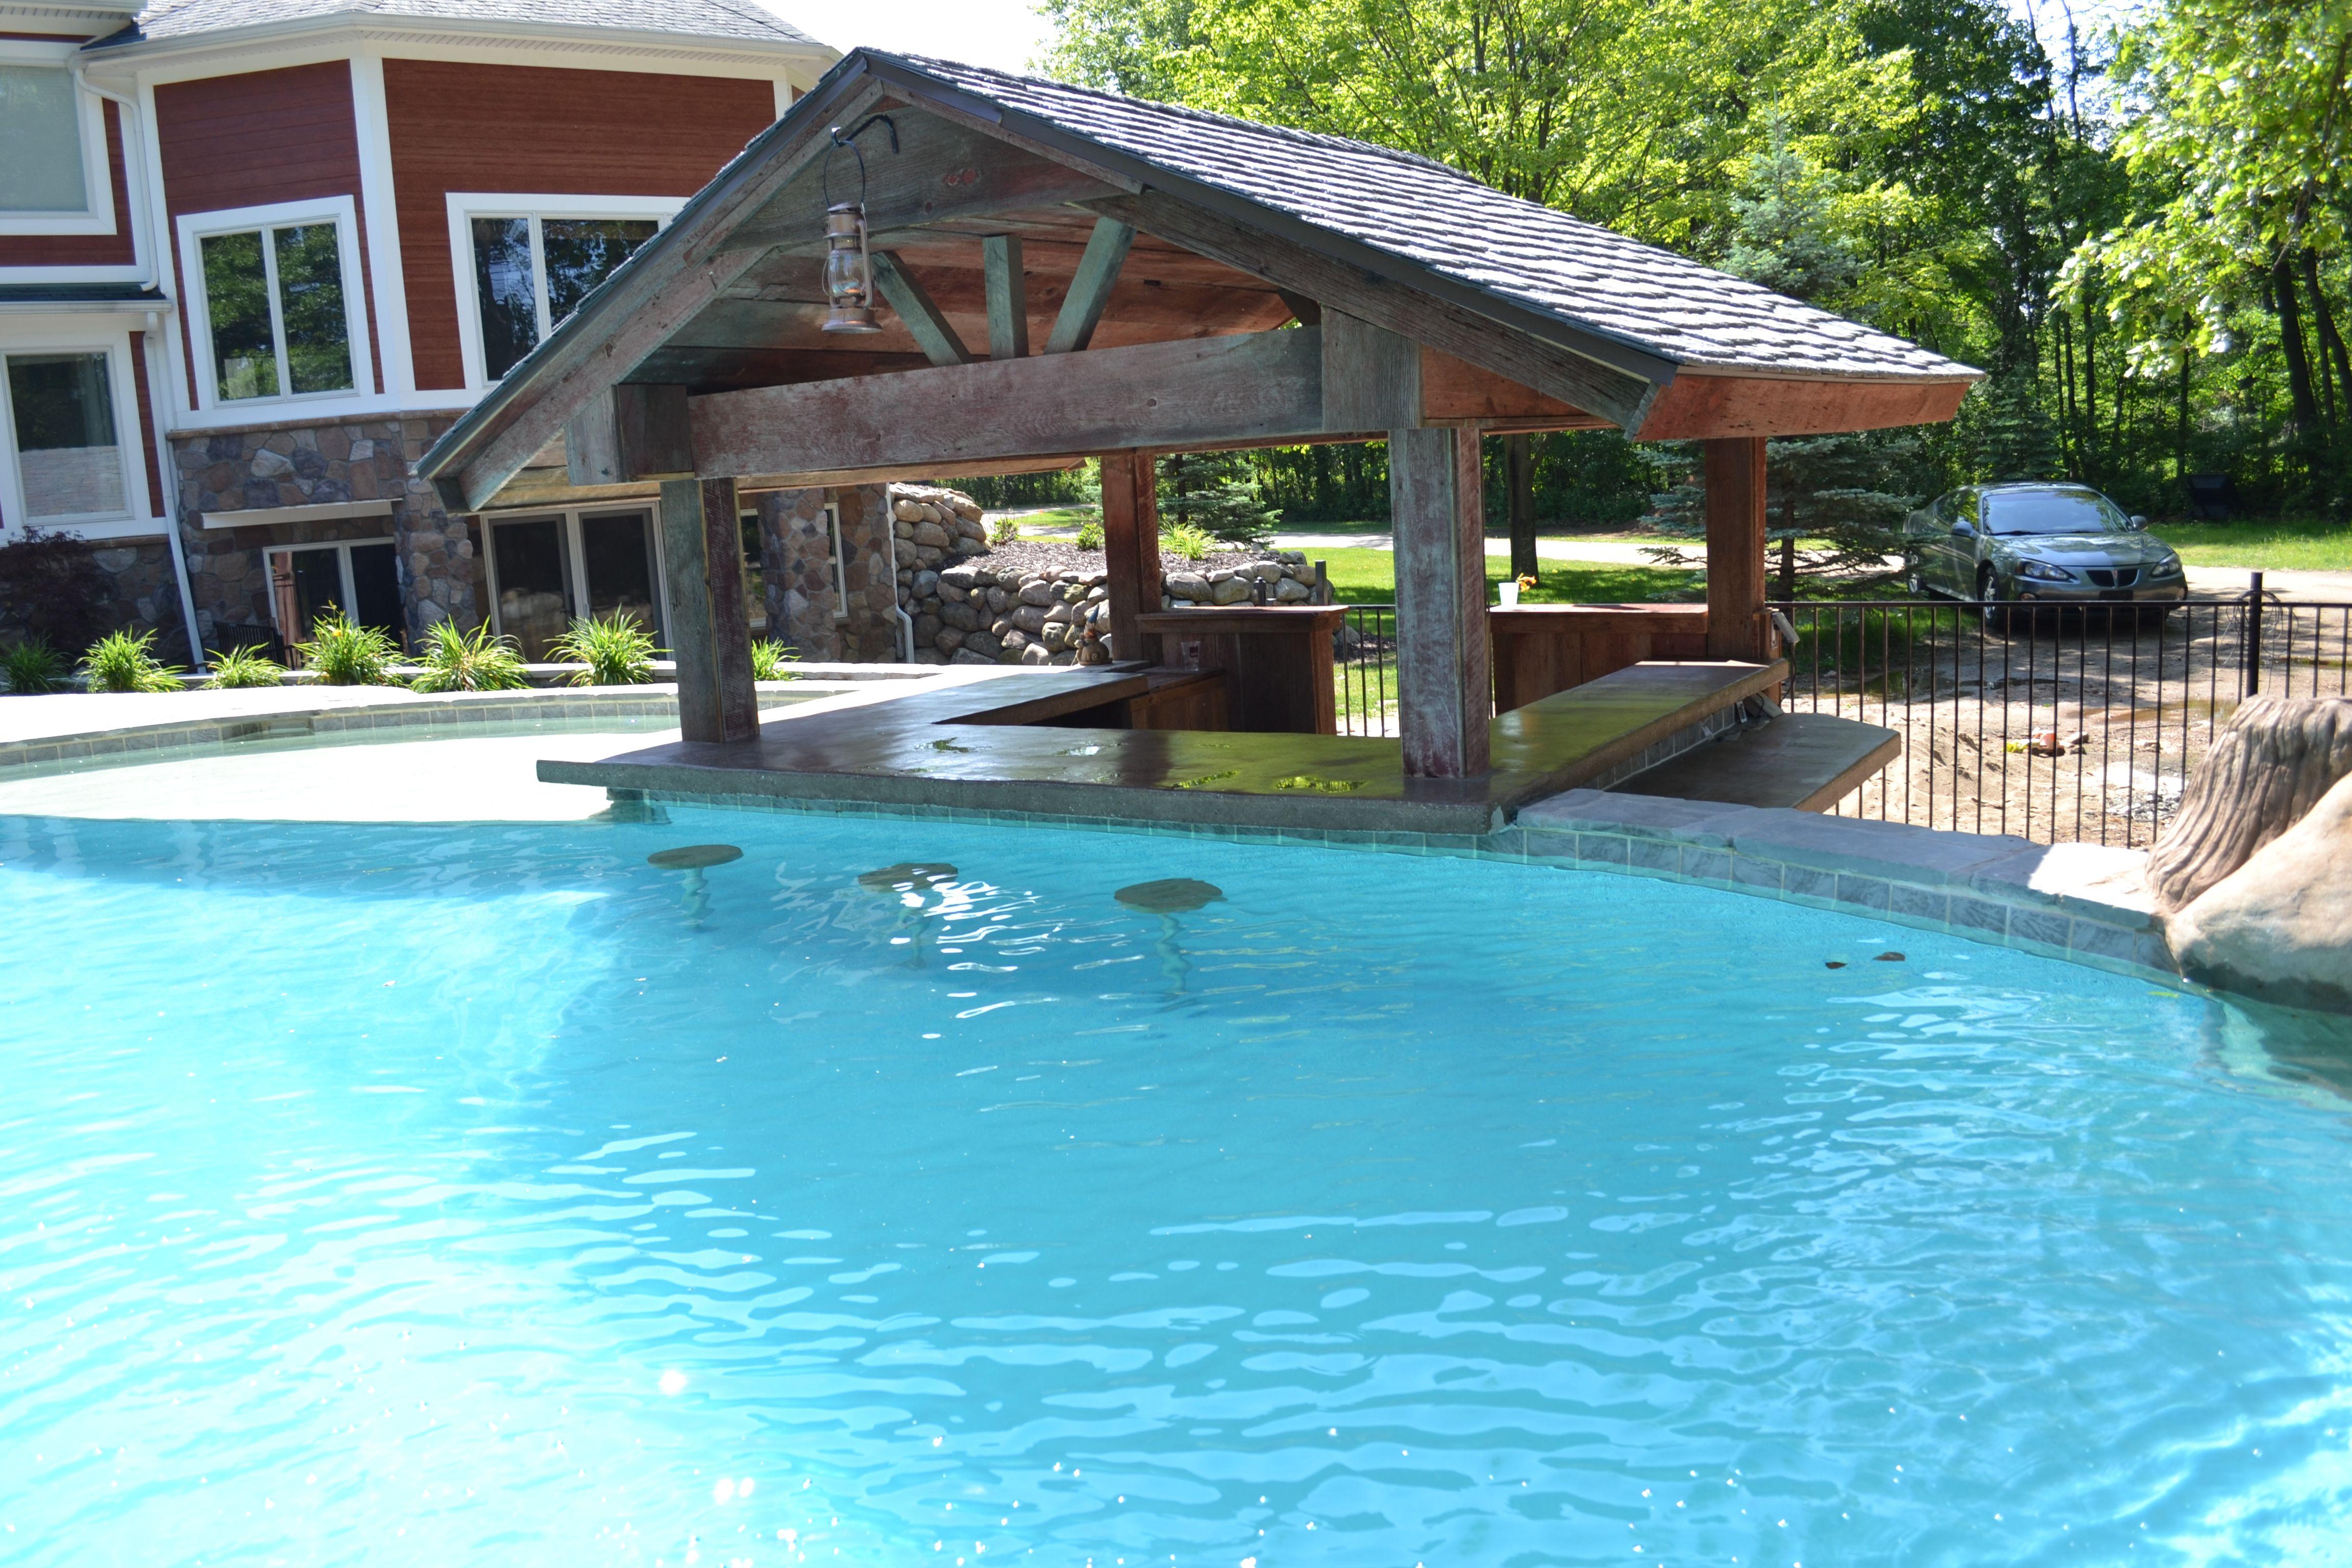 Hybrid pool hof in brighton mi legendary escapes for Pool design with swim up bar